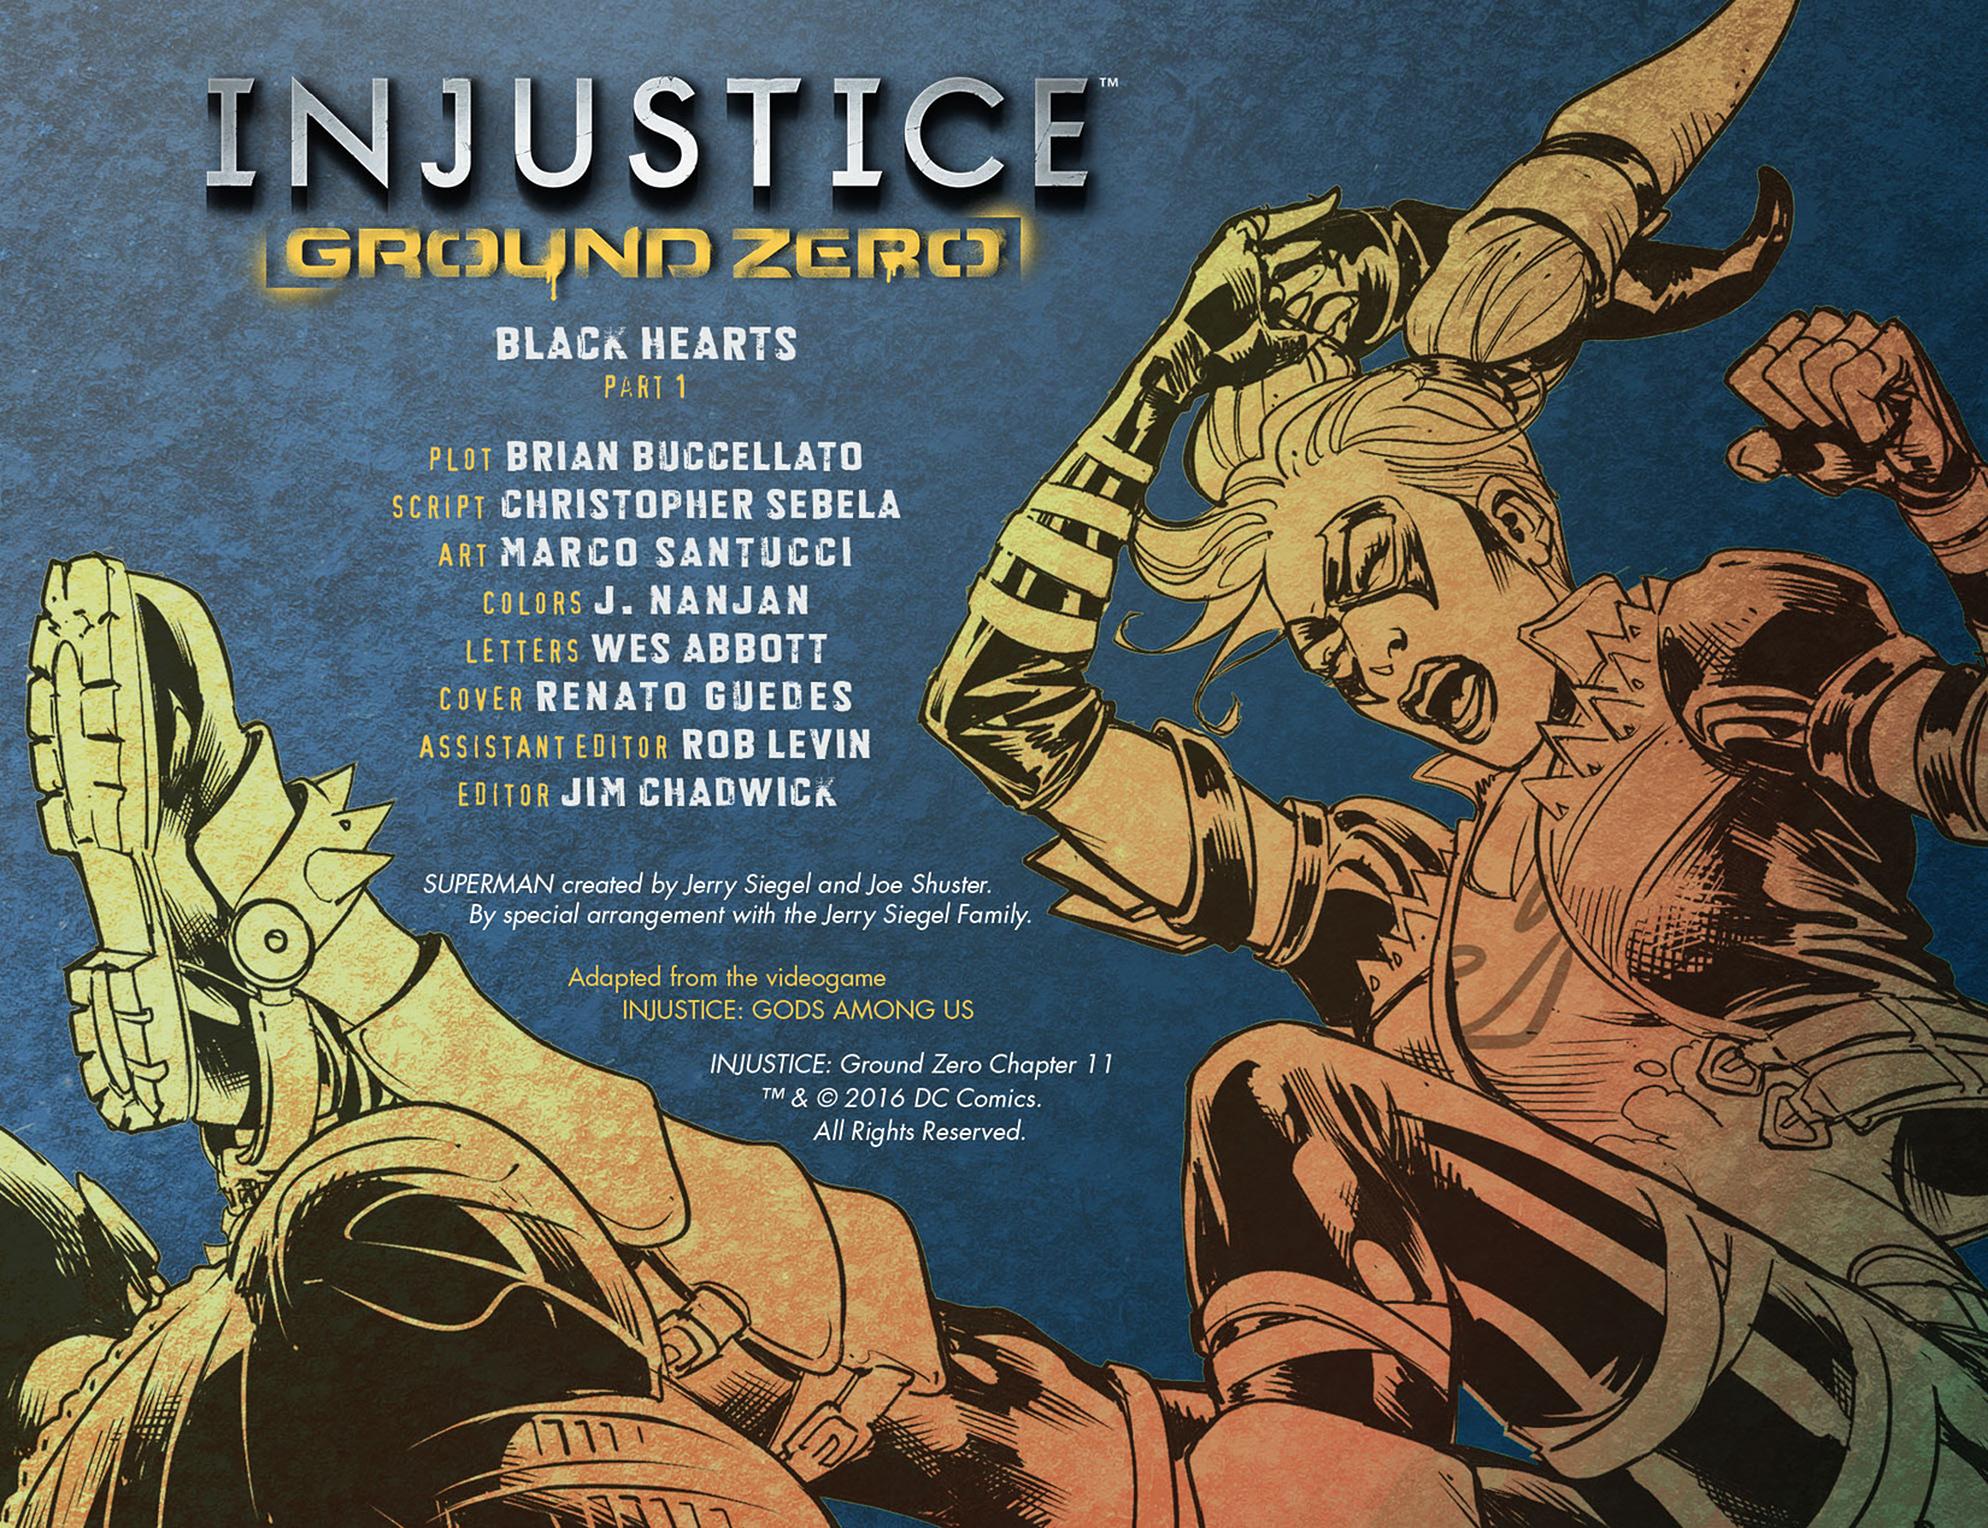 Read online Injustice: Ground Zero comic -  Issue #11 - 3